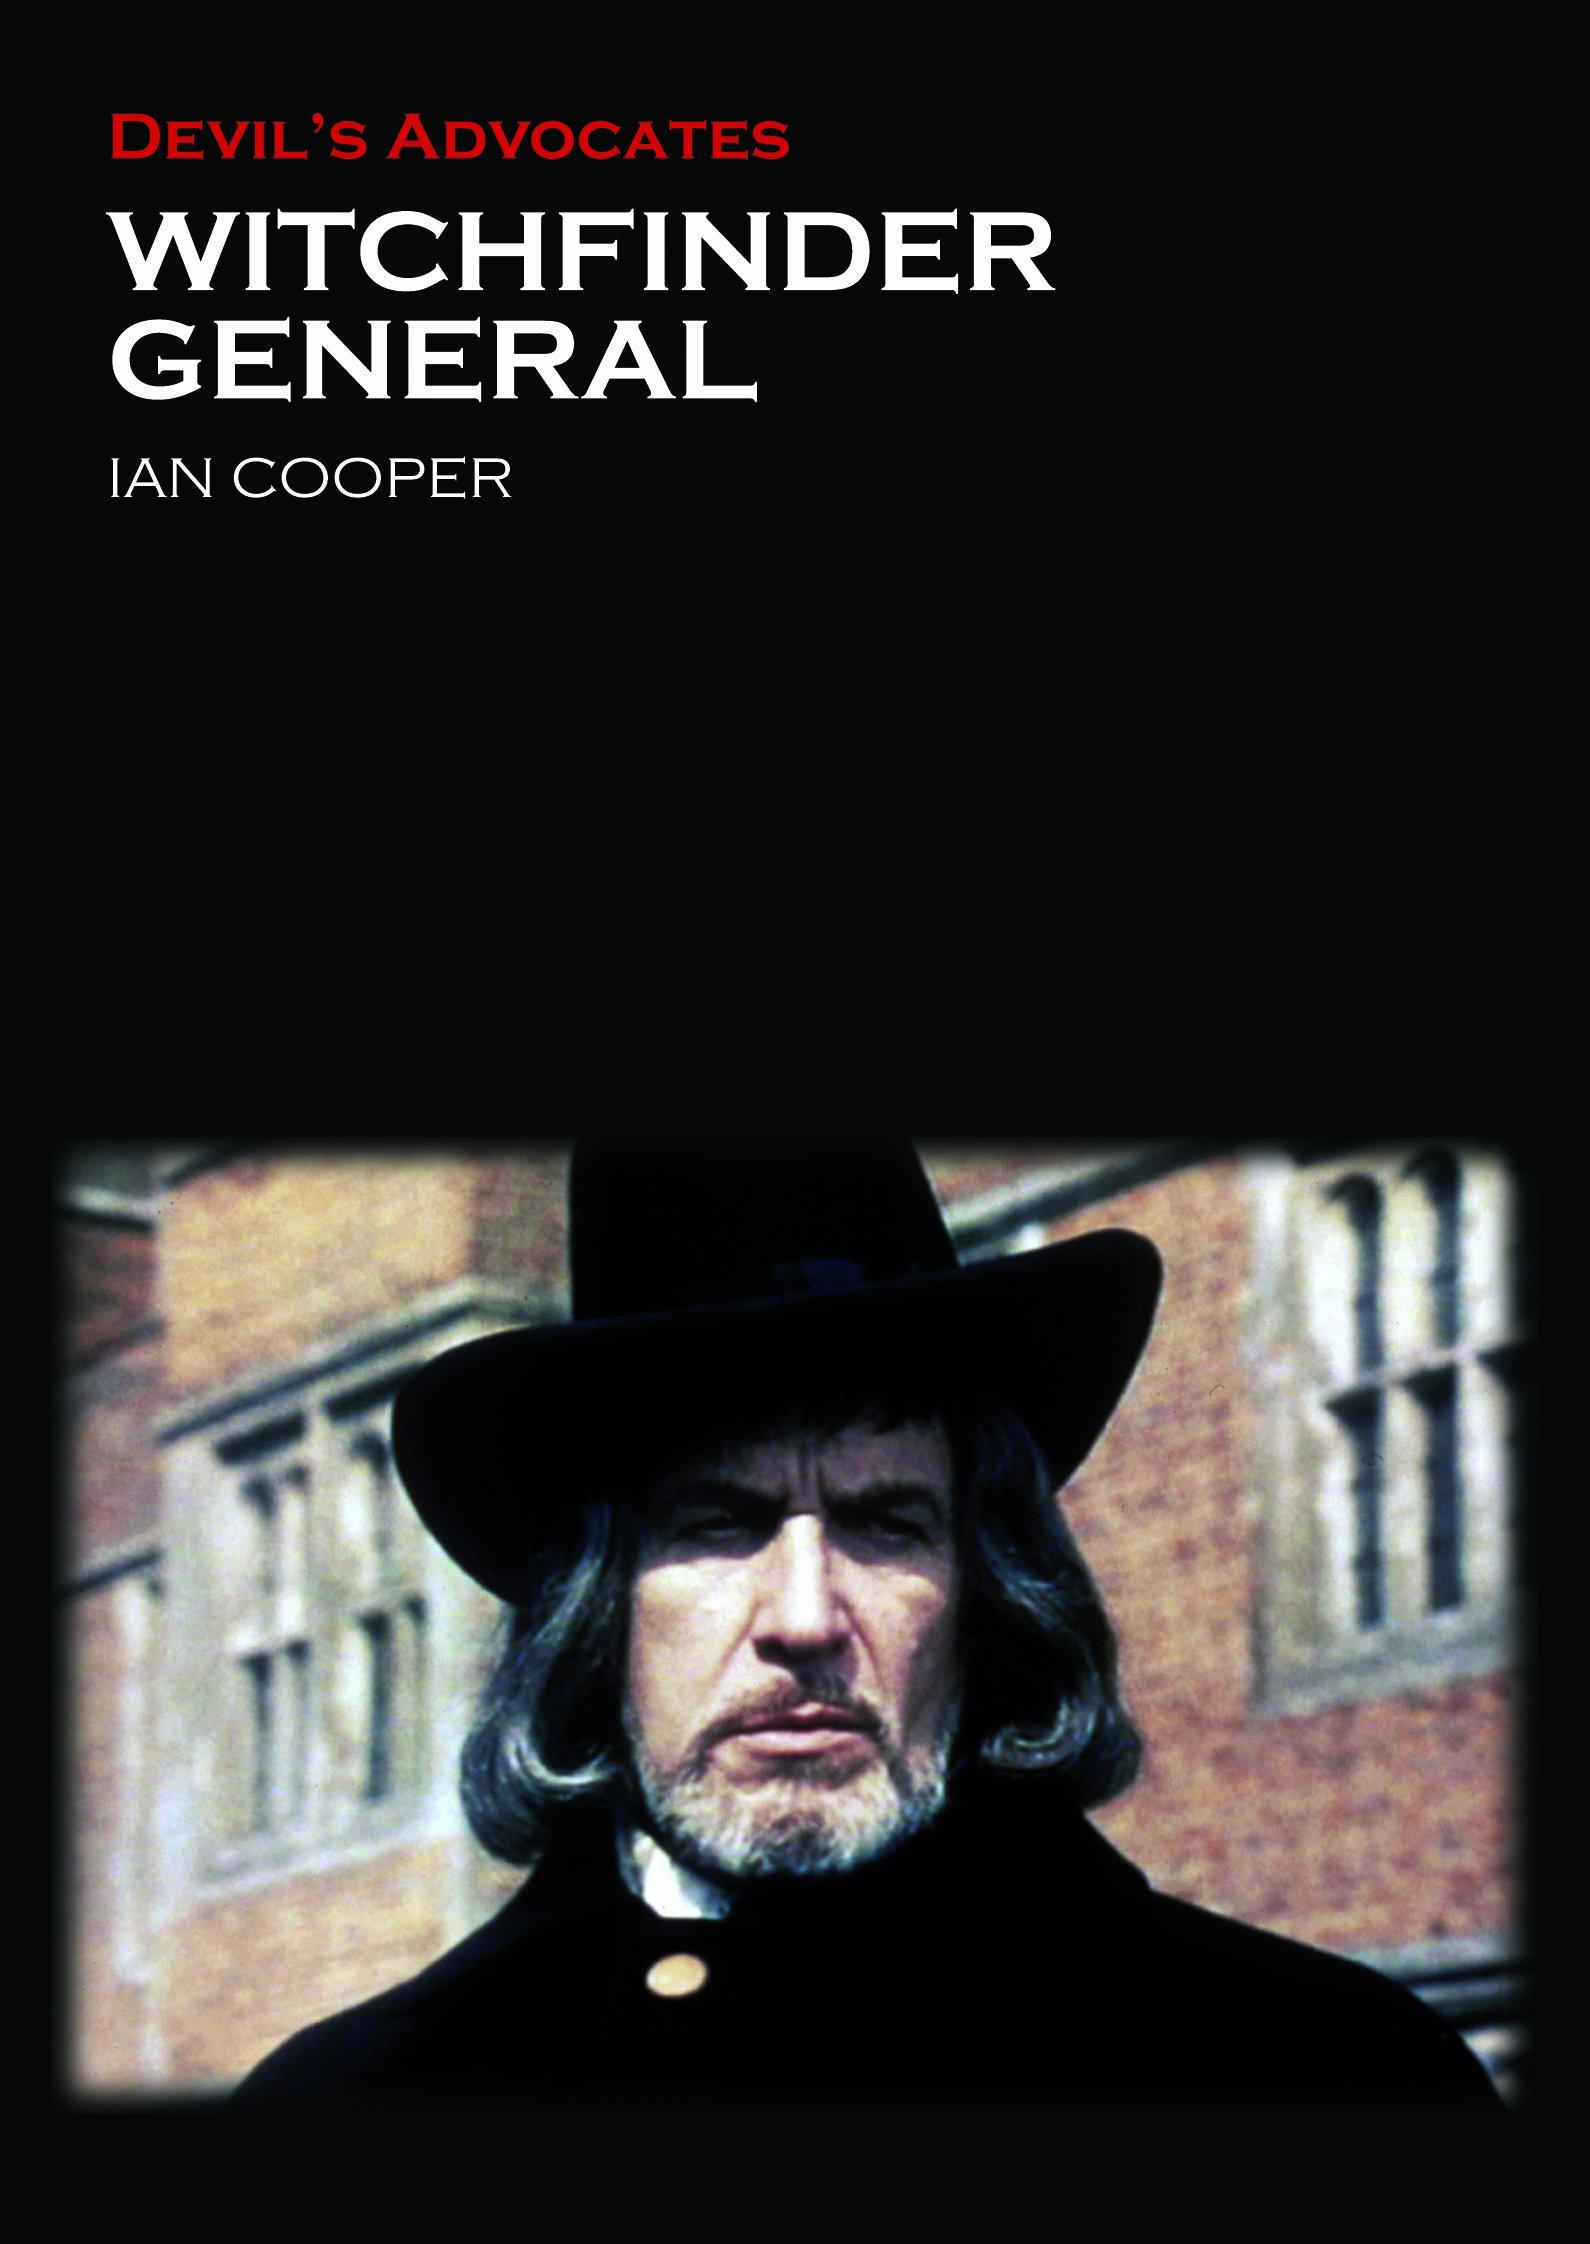 Buy Witchfinder General